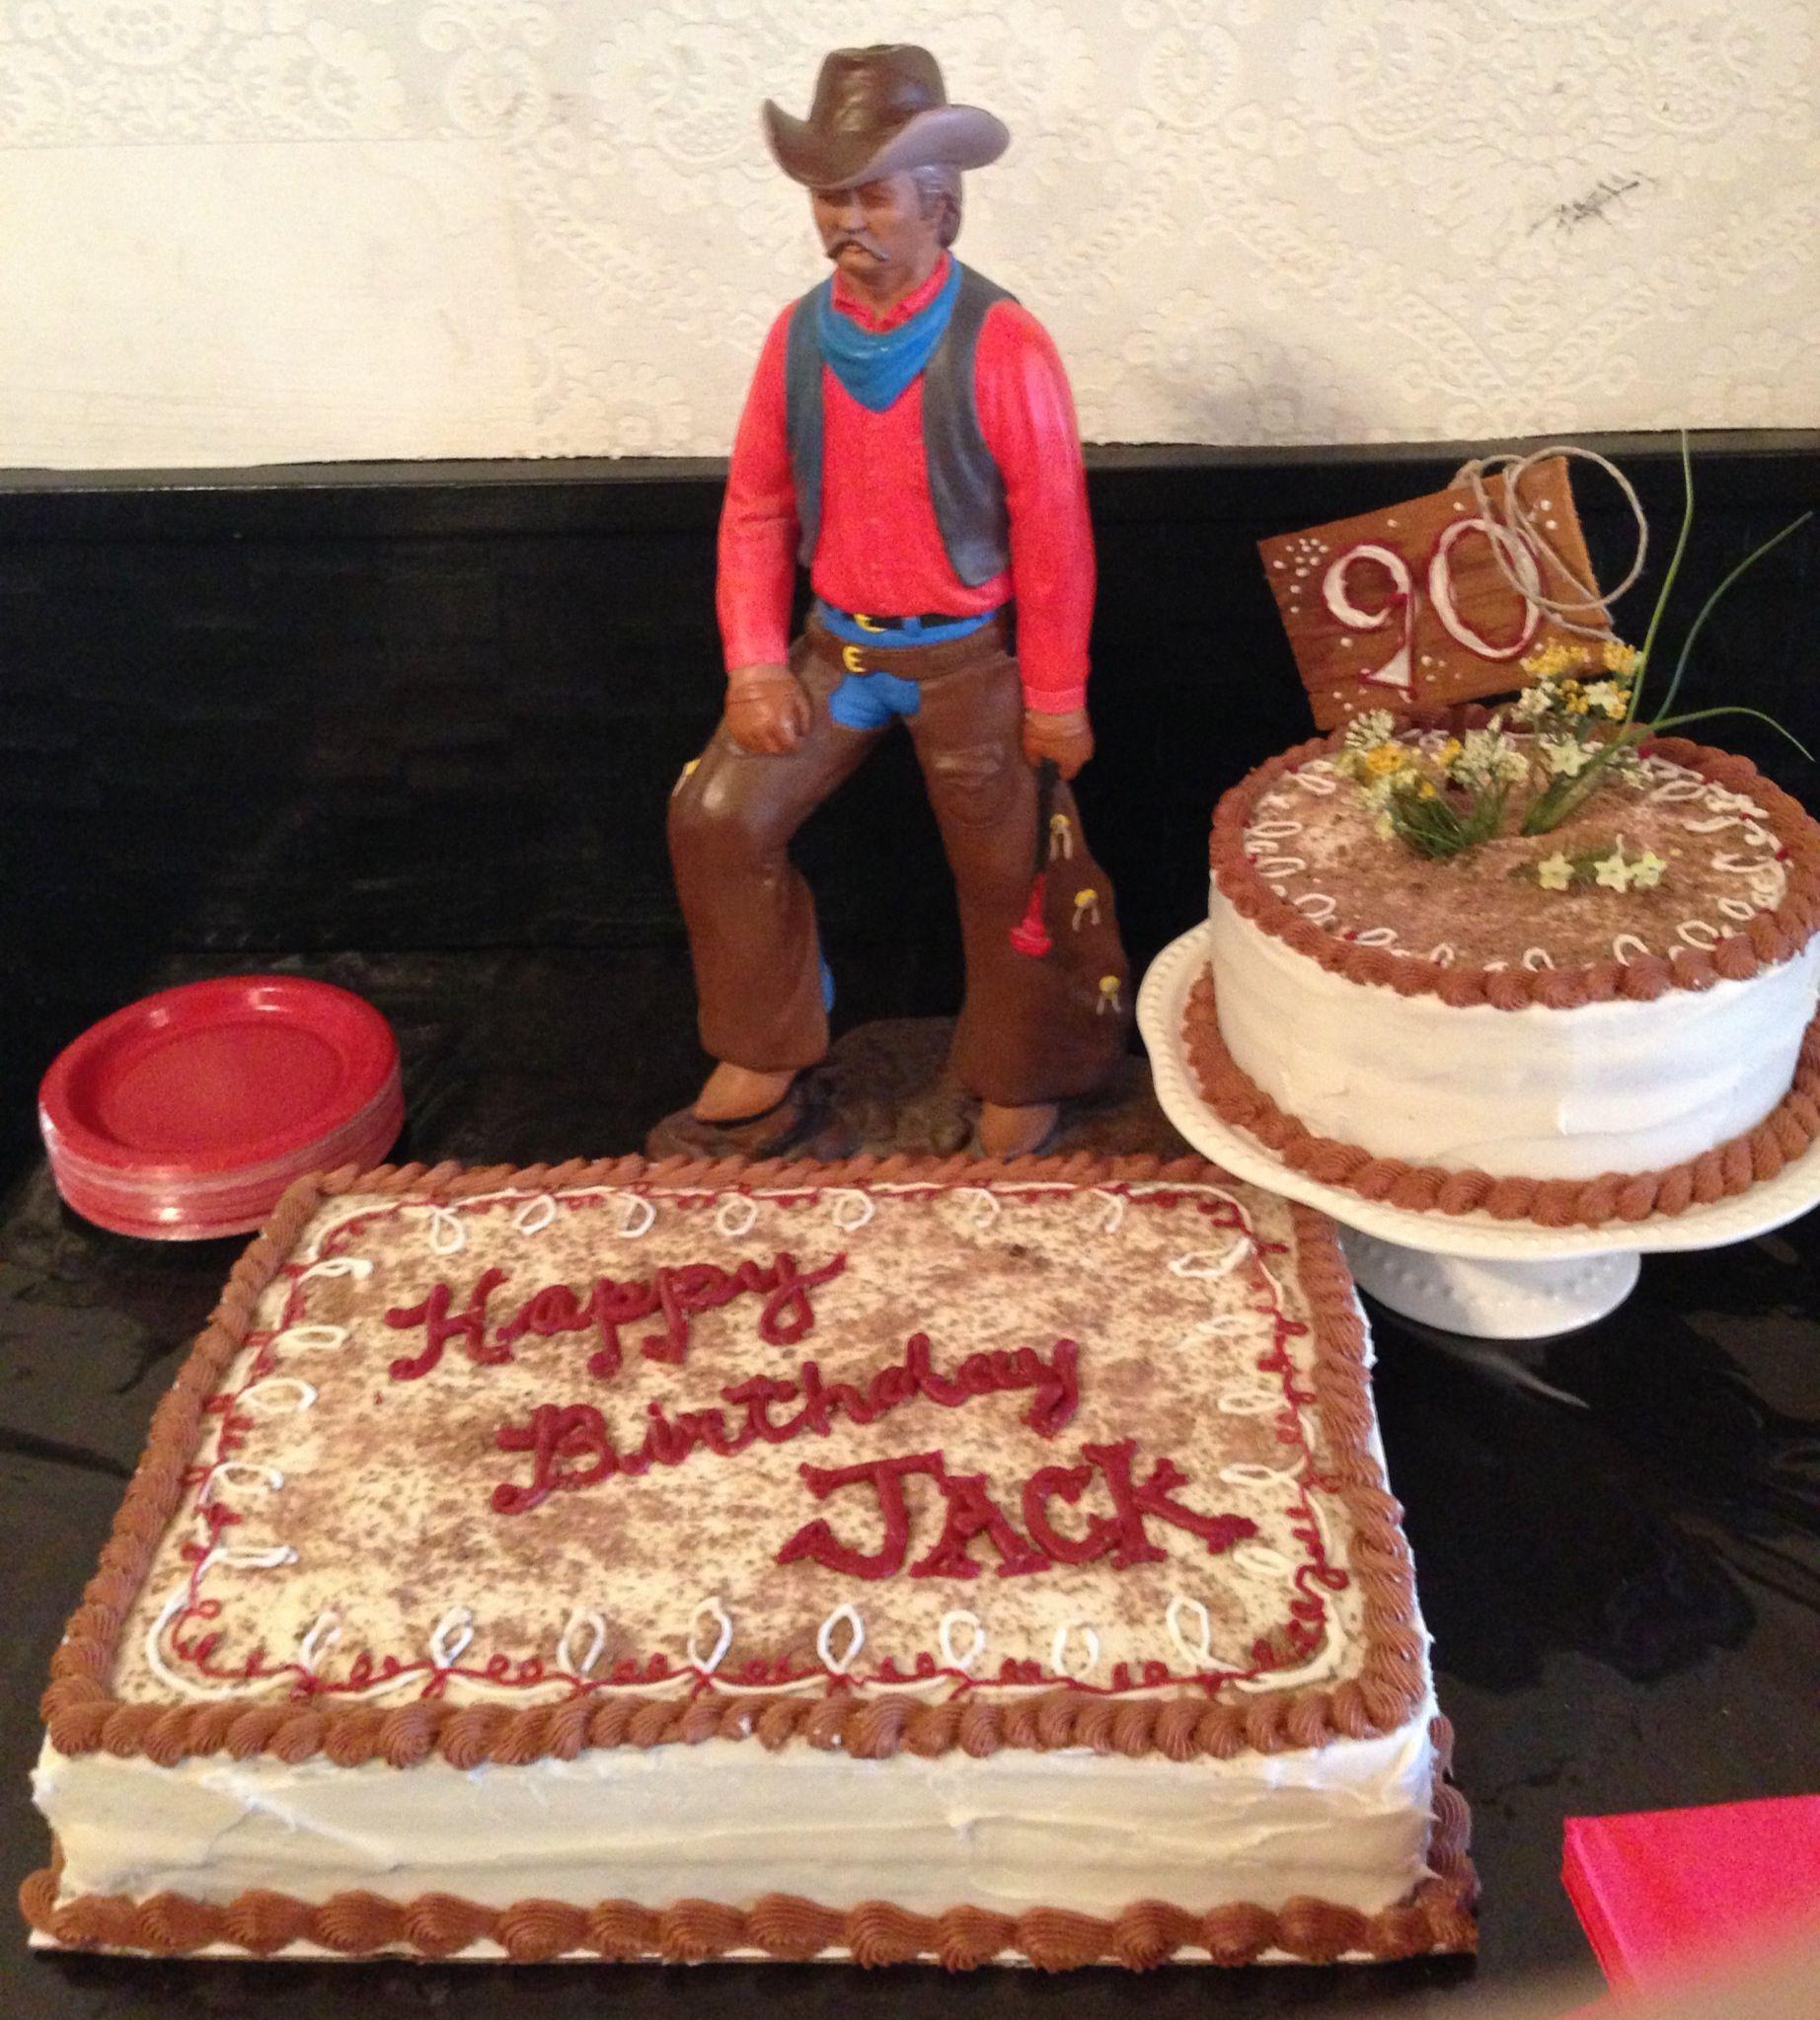 90th birthday cake for cowboy grandpa  Party Ideas  Pinterest